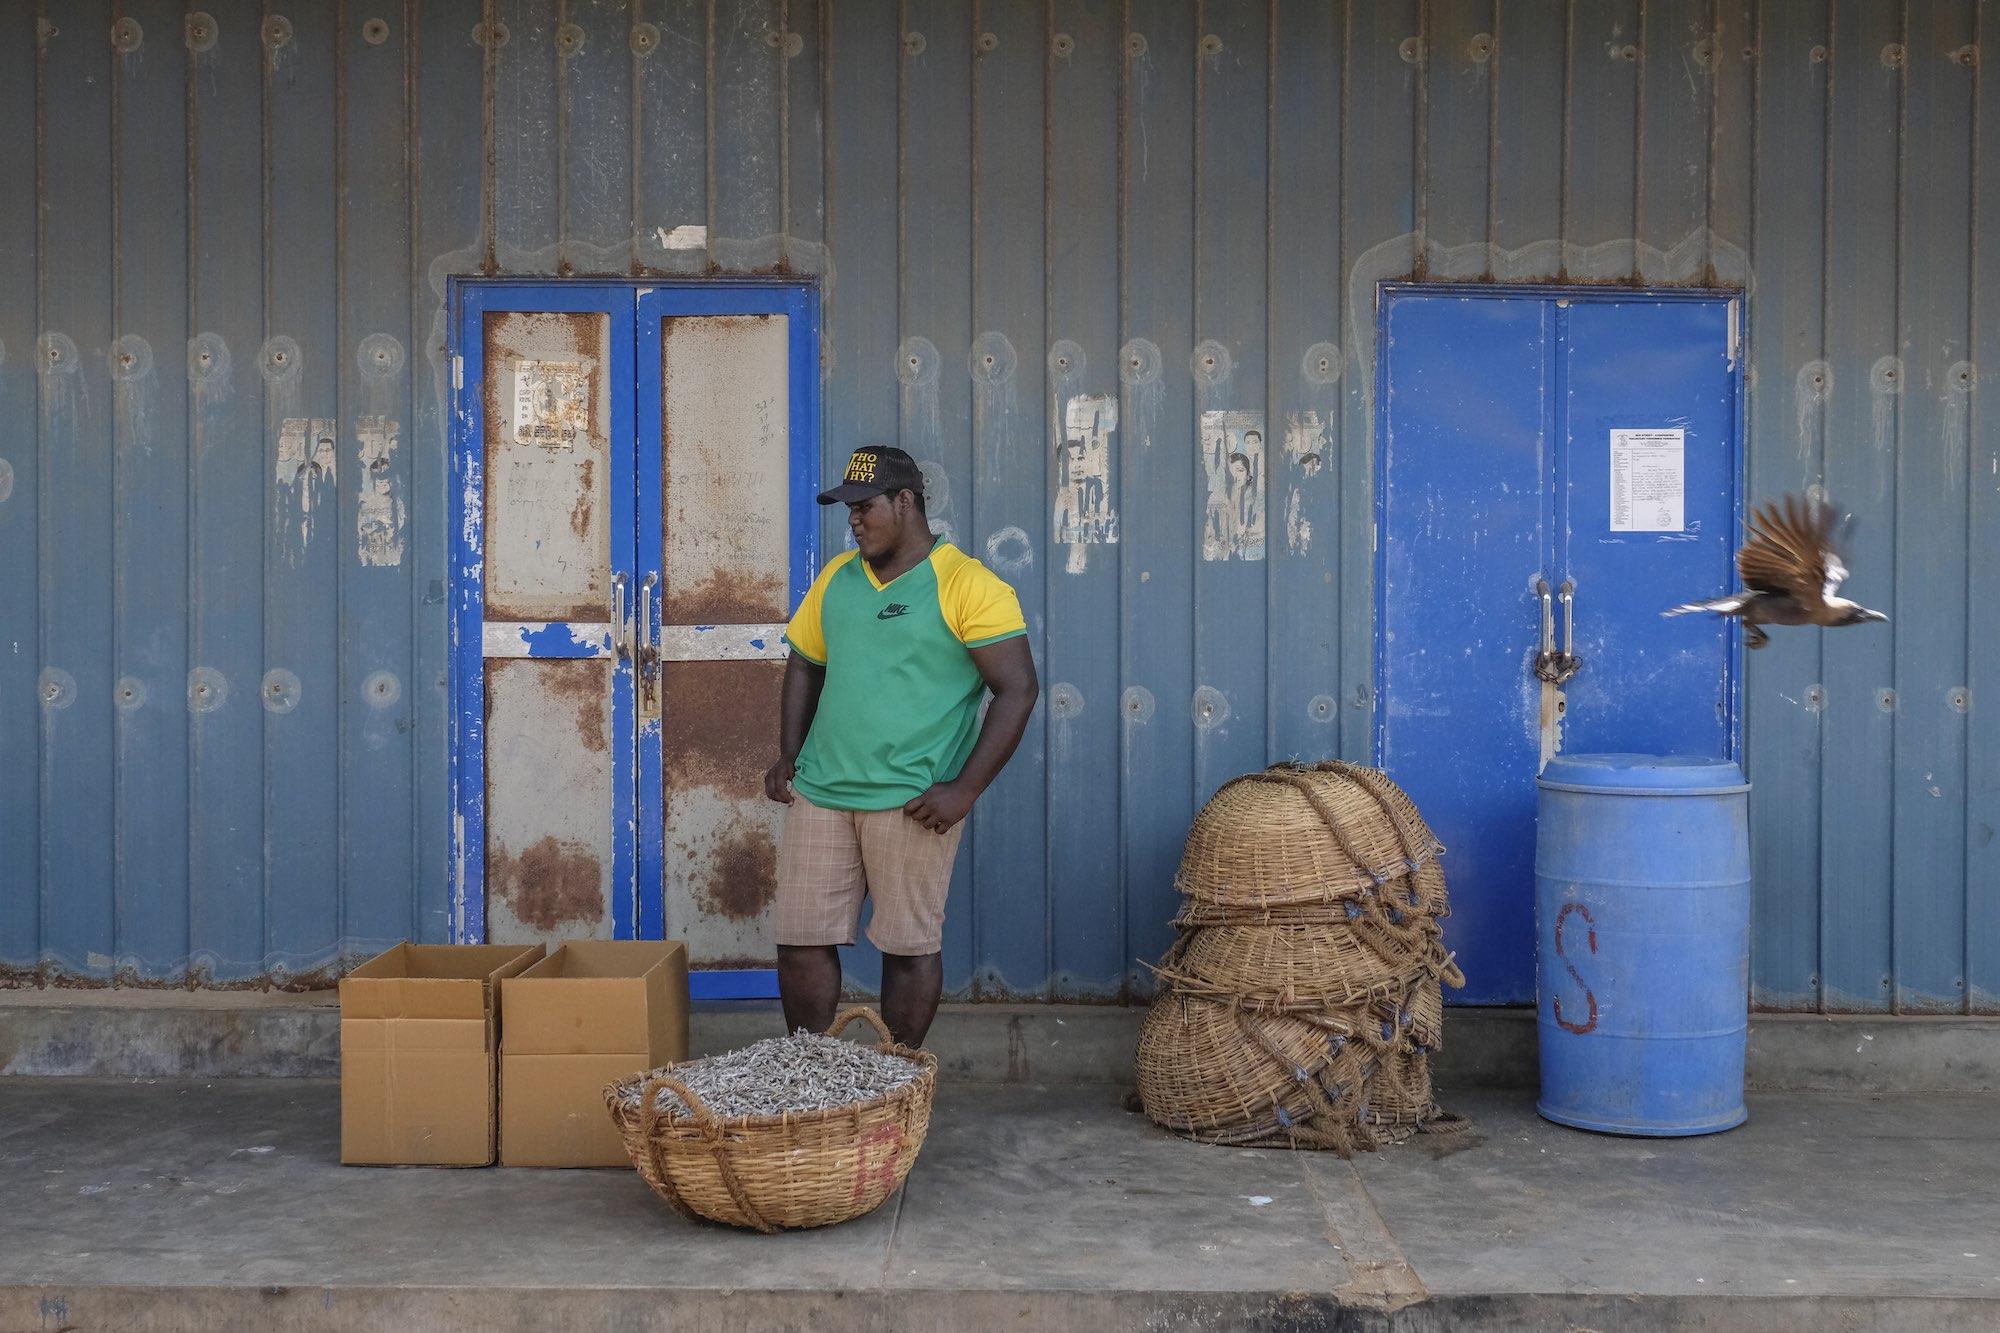 Negombo sri lanka travel fish market blue Fujifilm XE3